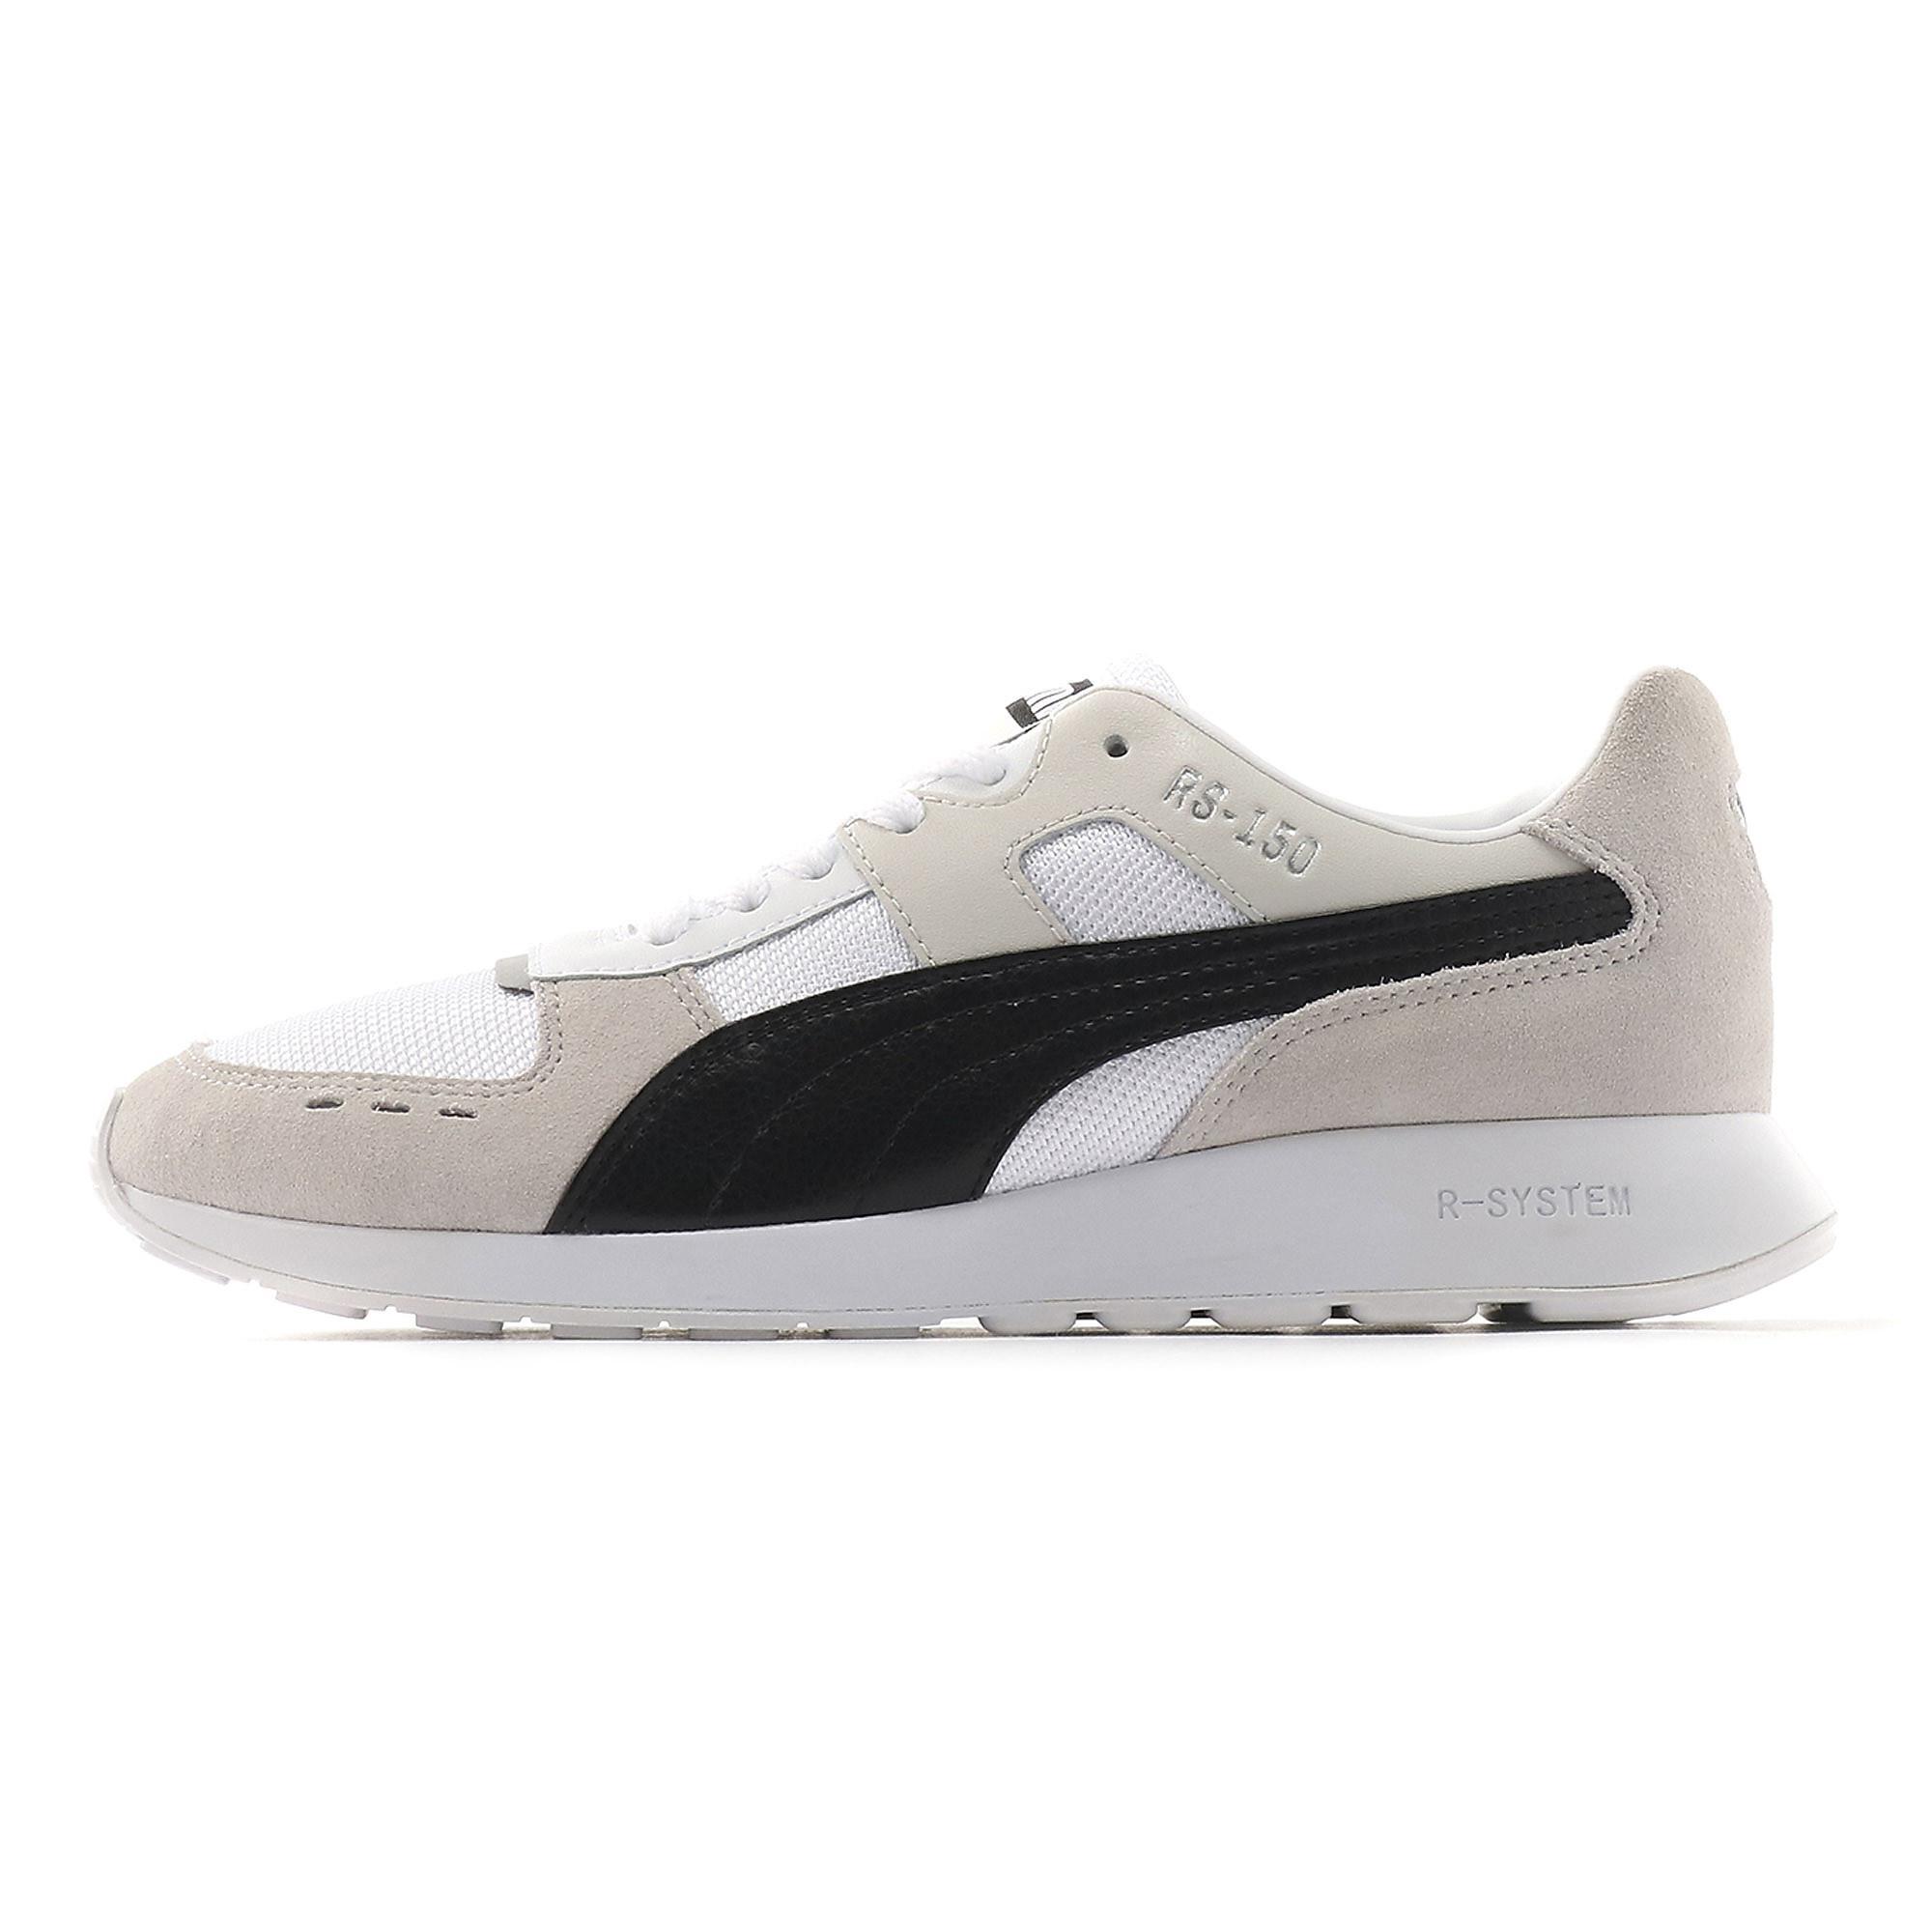 4a201dbcd1b PUMA Metallic Rs-150 Mesh Women's Sneakers